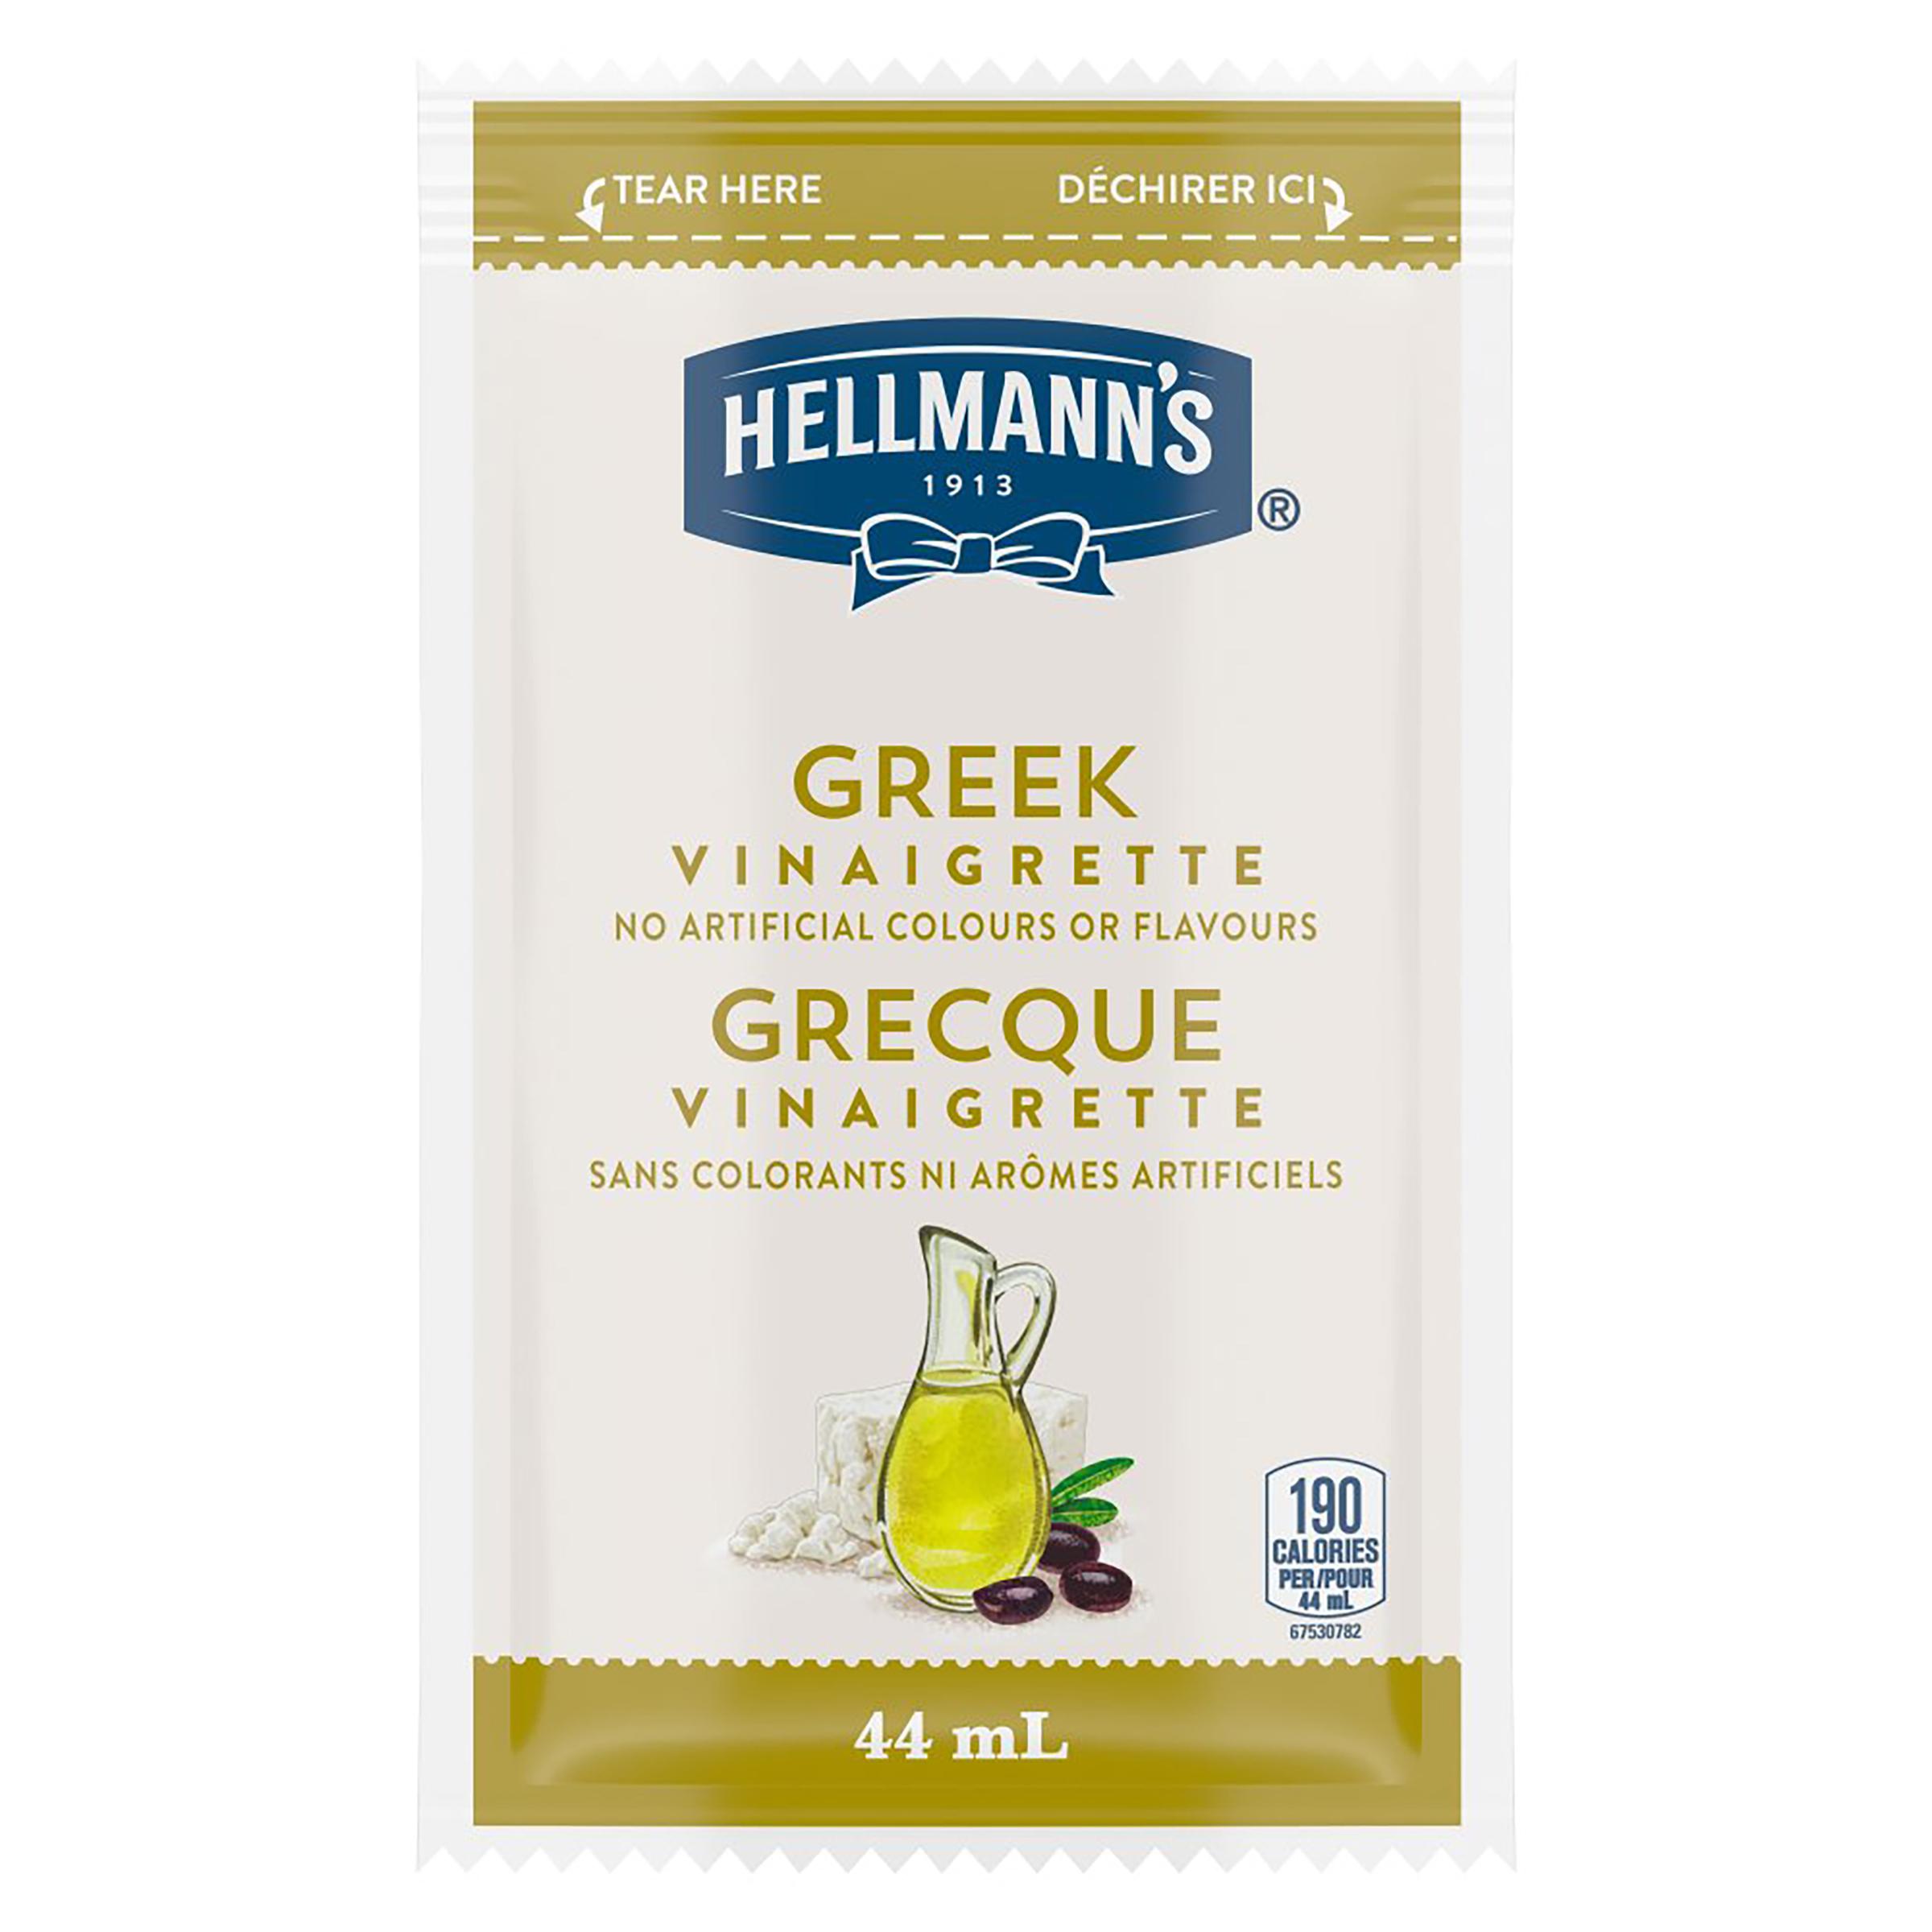 Hellmann's® Greek Vinaigrette Sachet 102 x 44 ml -